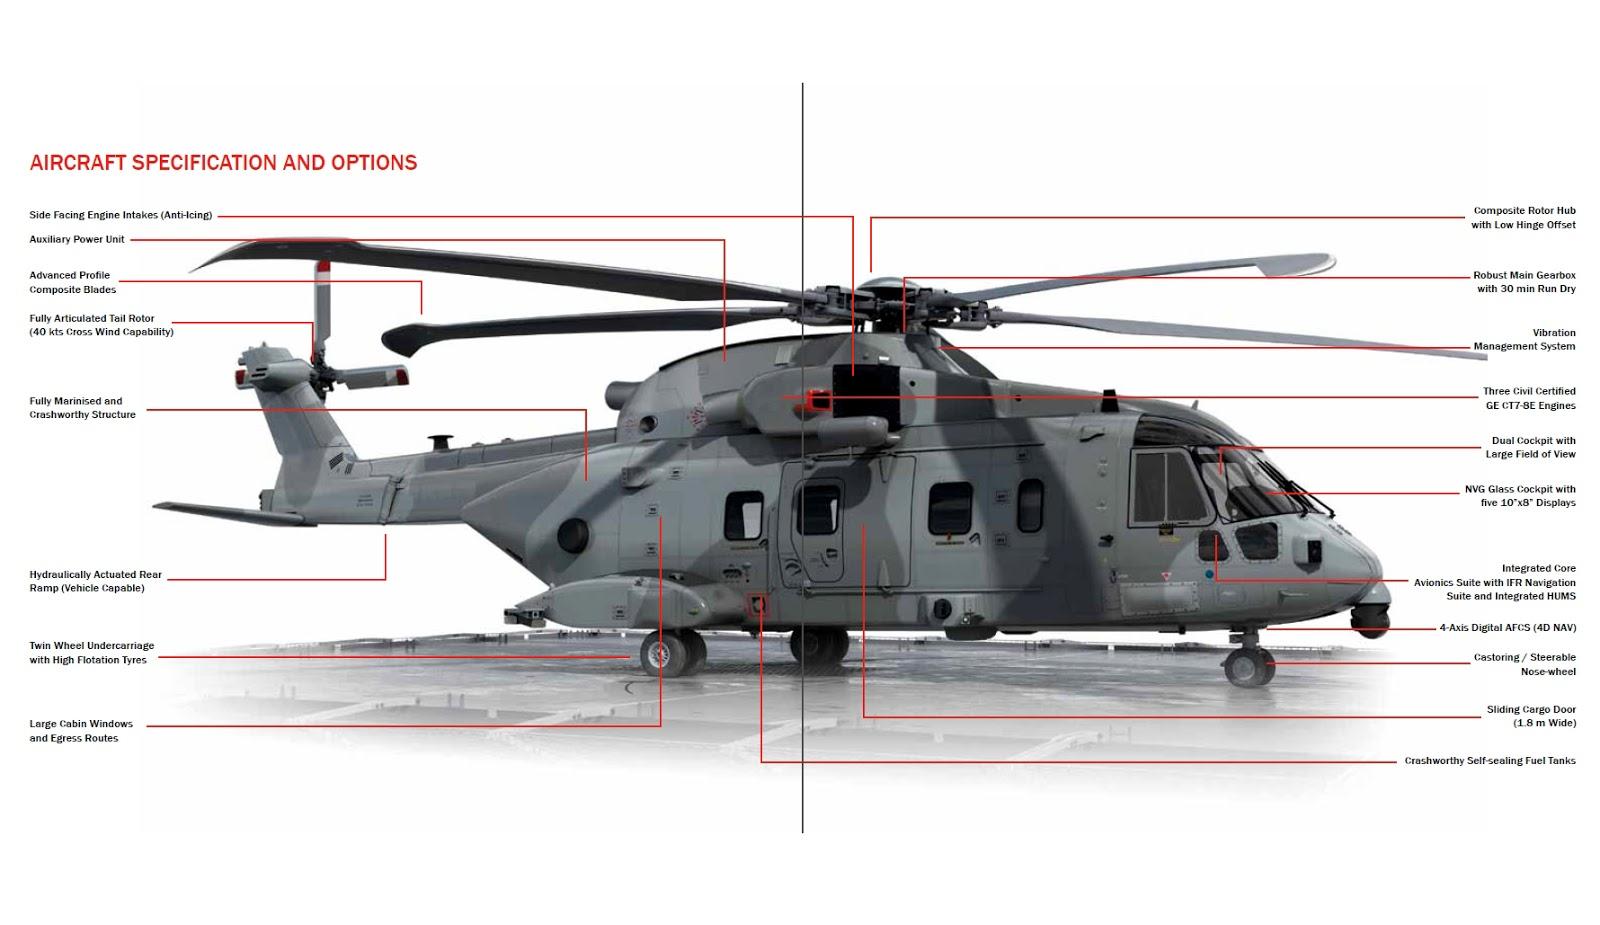 Spesifikasi AgustaWestland AW101